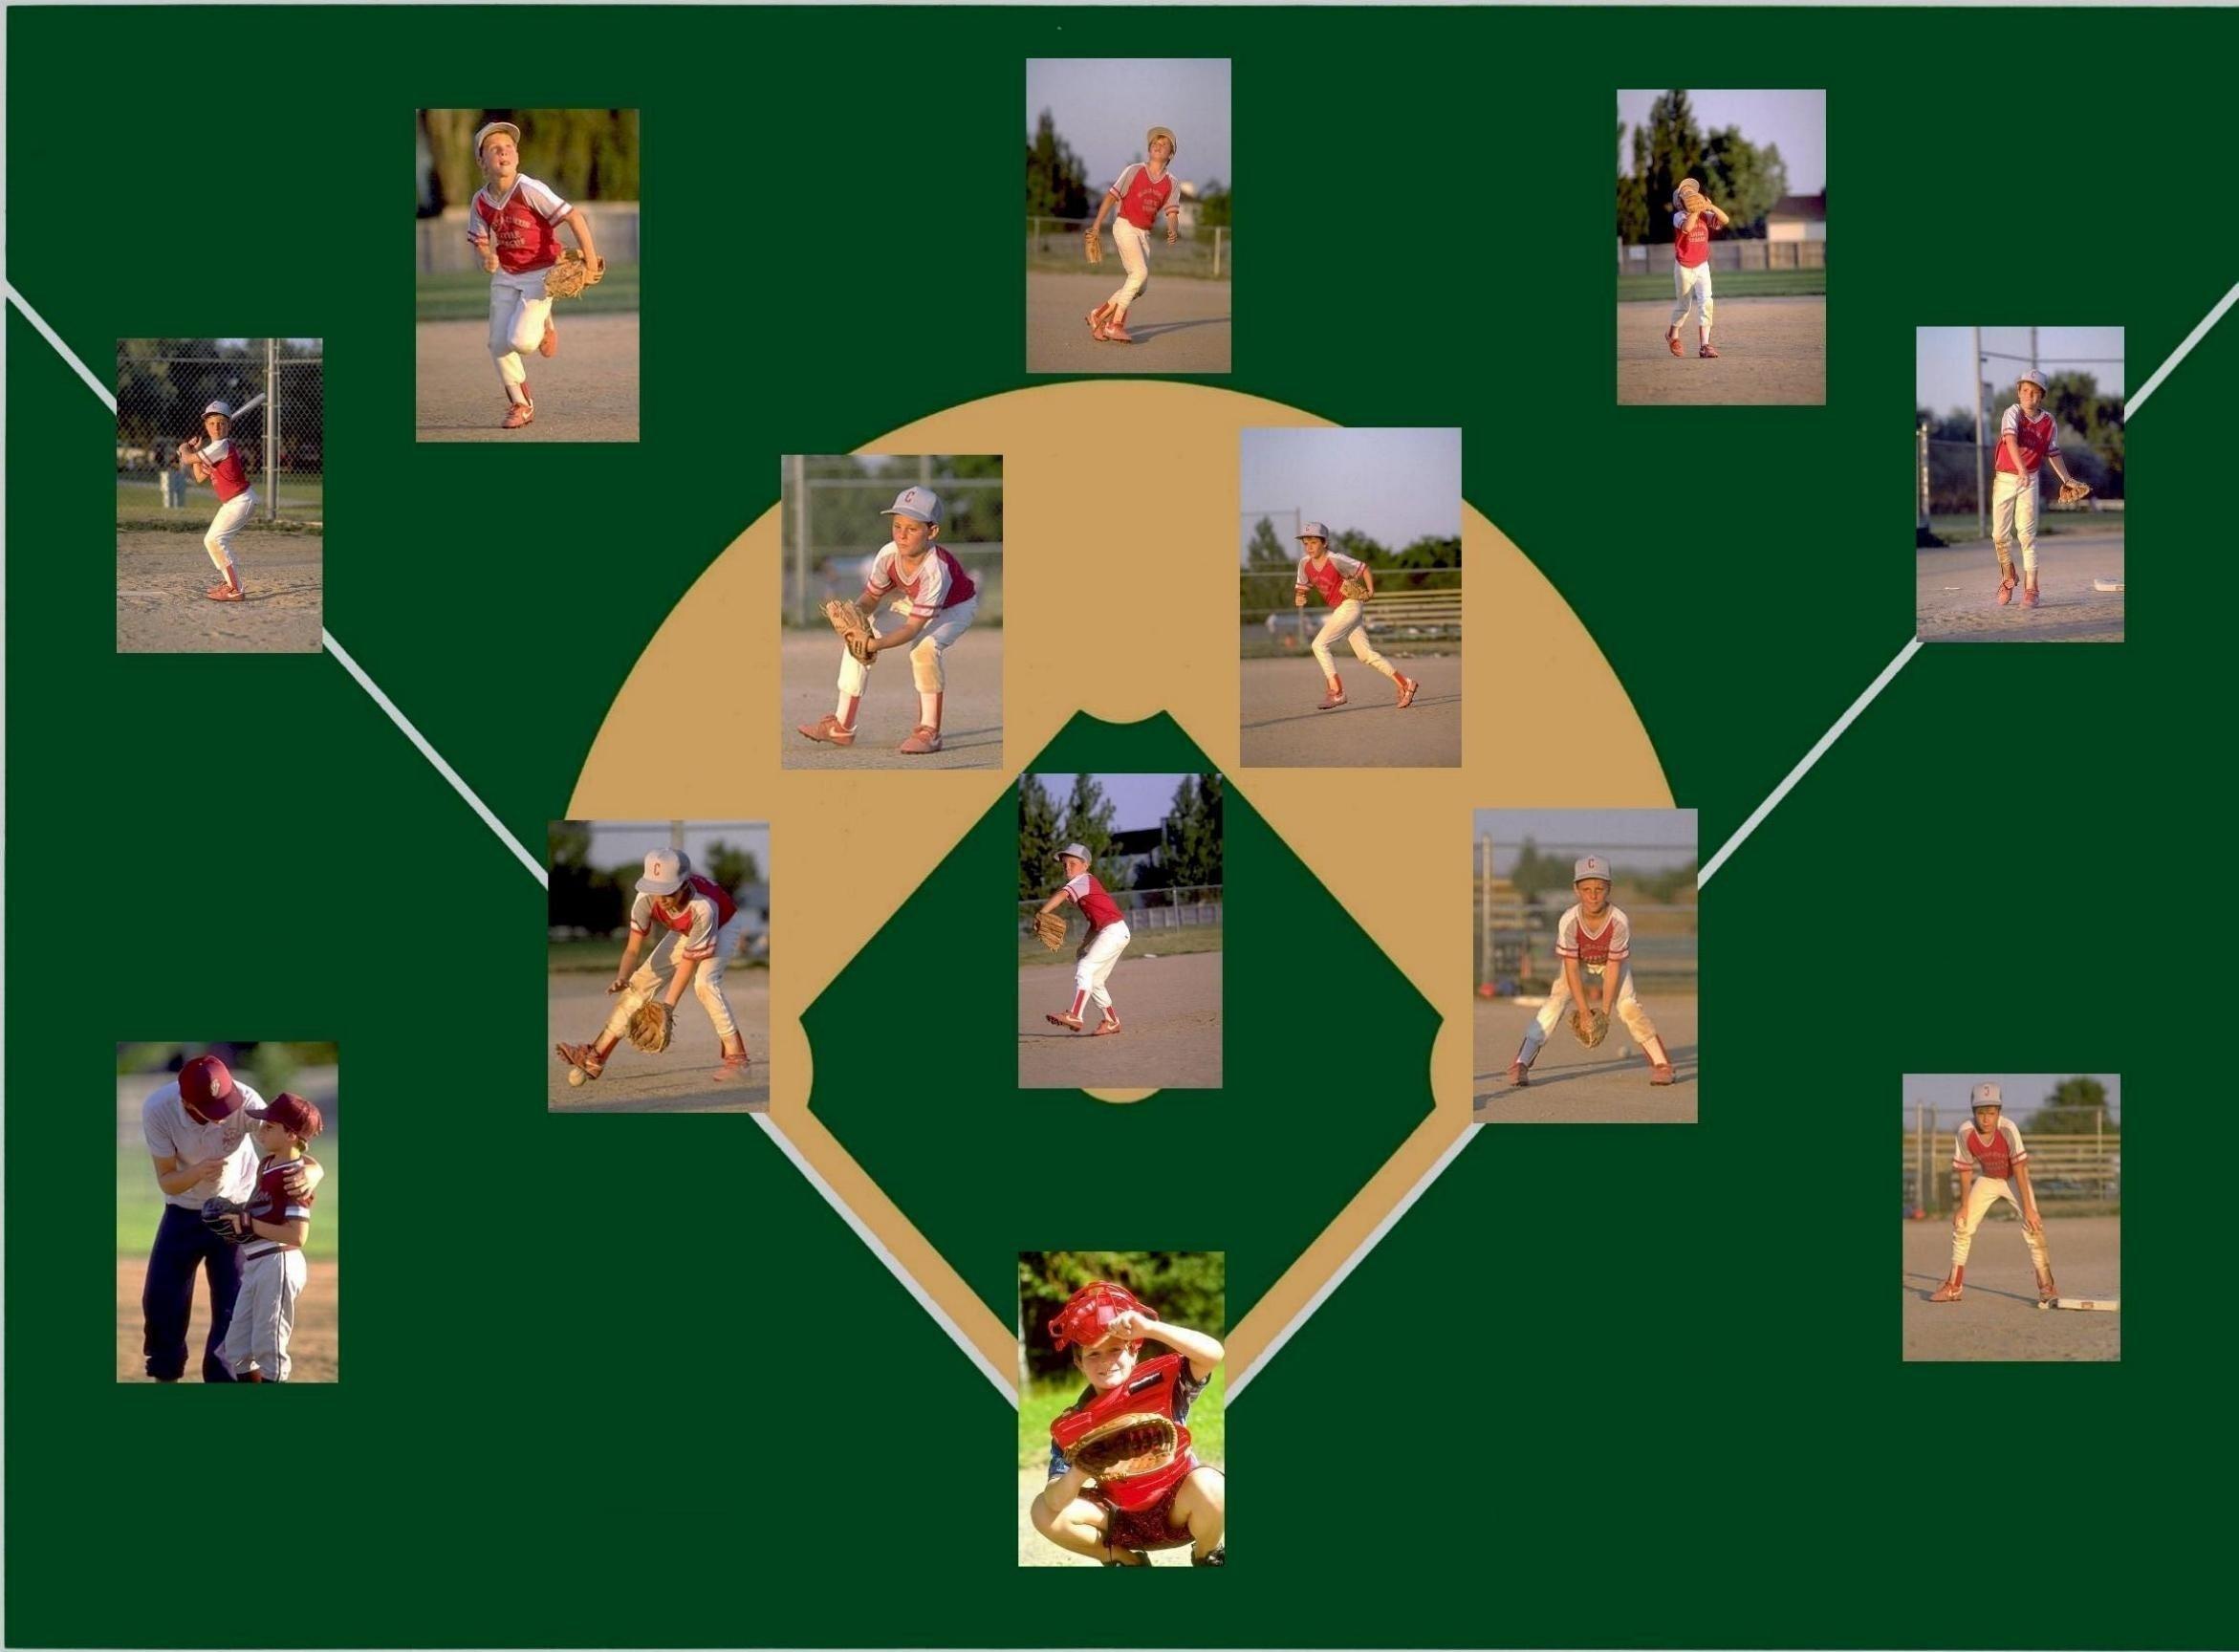 10 Attractive Fundraising Ideas For Softball Teams baseball posters baseball fundraising ideas customized baseball 1 2020